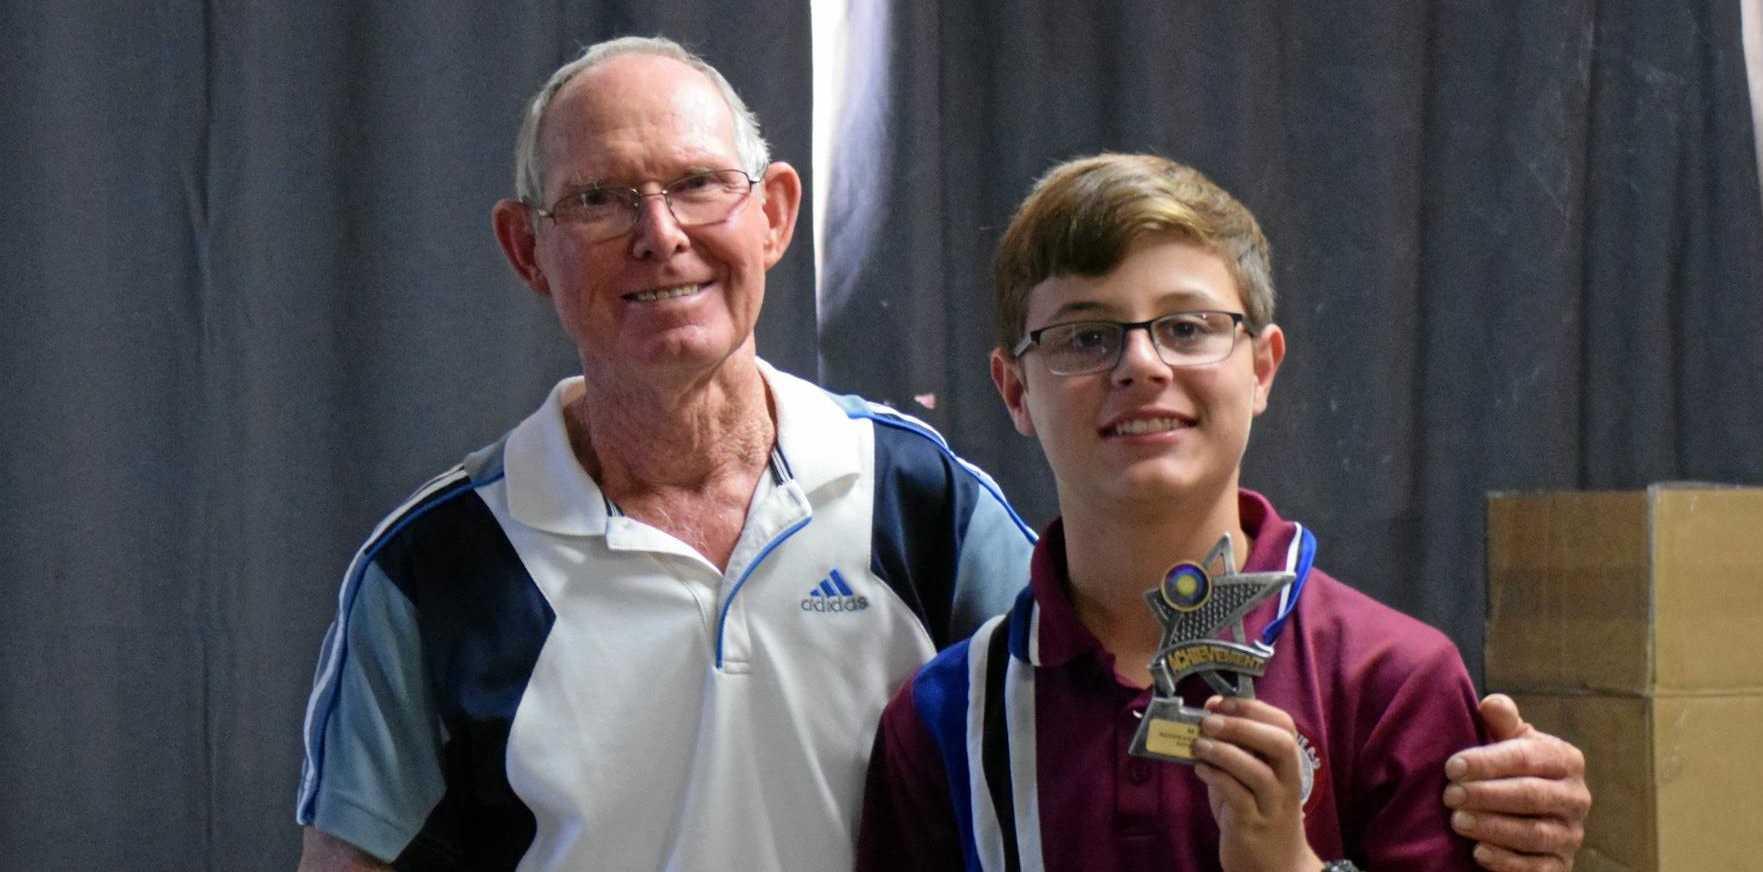 Ken Colyer presents a young Mundubbera tennis star with his award at the Mundubbera Junior Tennis awards presentation.